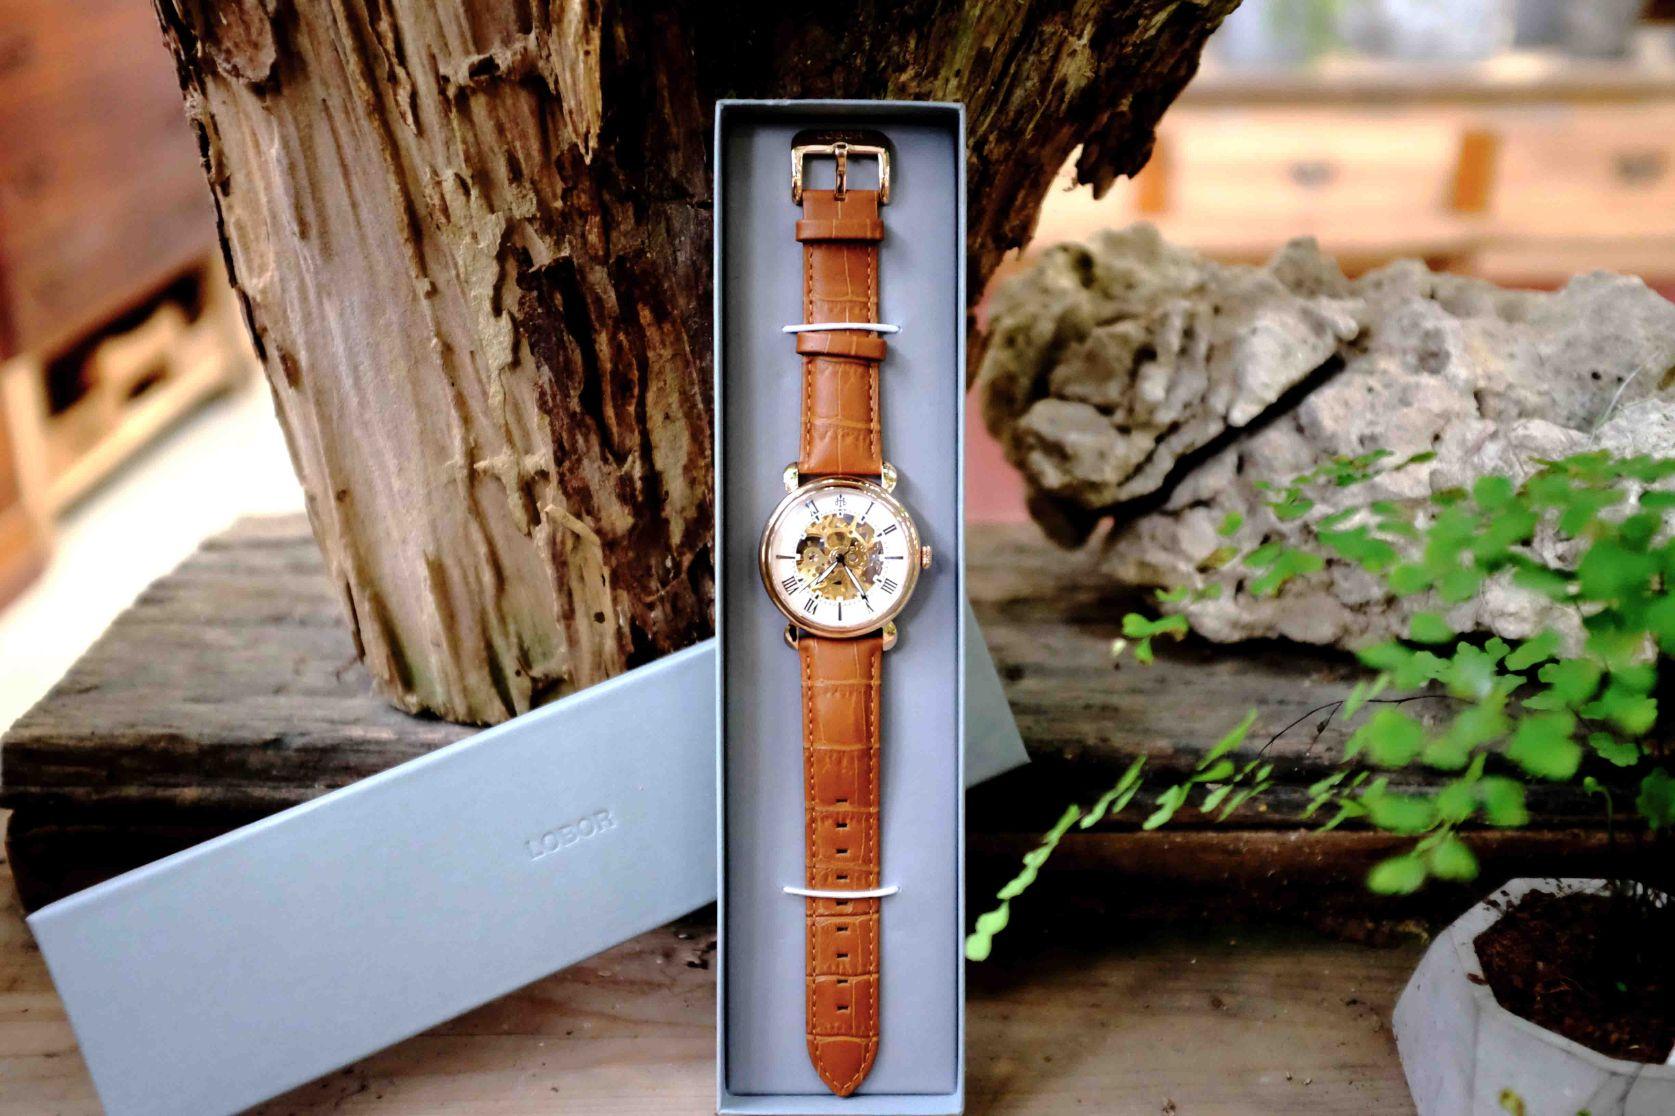 Daniel Wellington,DW,DW手錶,DW折扣碼,情侶對錶,手錶,手錶穿搭,折扣碼 @黛西優齁齁 DaisyYohoho 世界自助旅行/旅行狂/背包客/美食生活